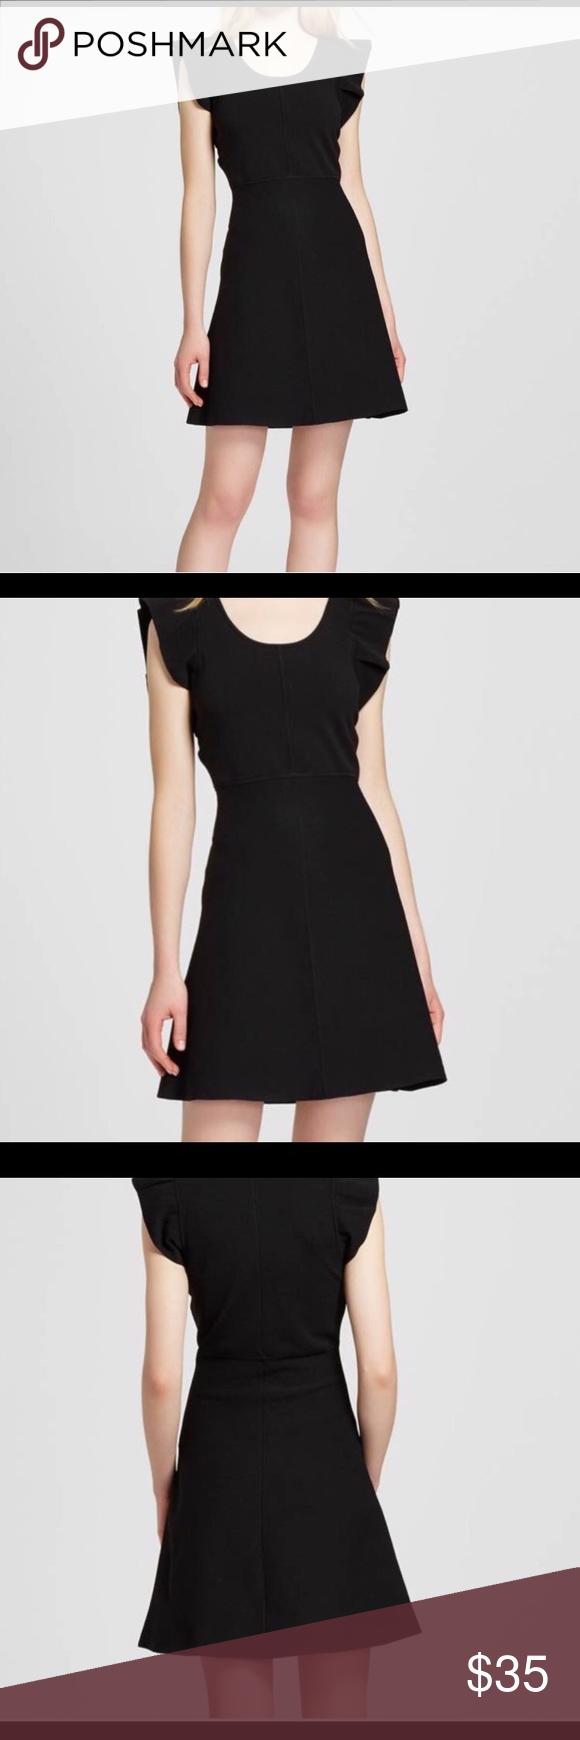 Nwt Victoria Beckham Black Ruffle Sleeve Dress Xs Victoria Beckham For Target Black Ruffle Sleeve Sweater Knit Dress Ruffle Sleeve Dress Dresses Black Ruffle [ 1740 x 580 Pixel ]